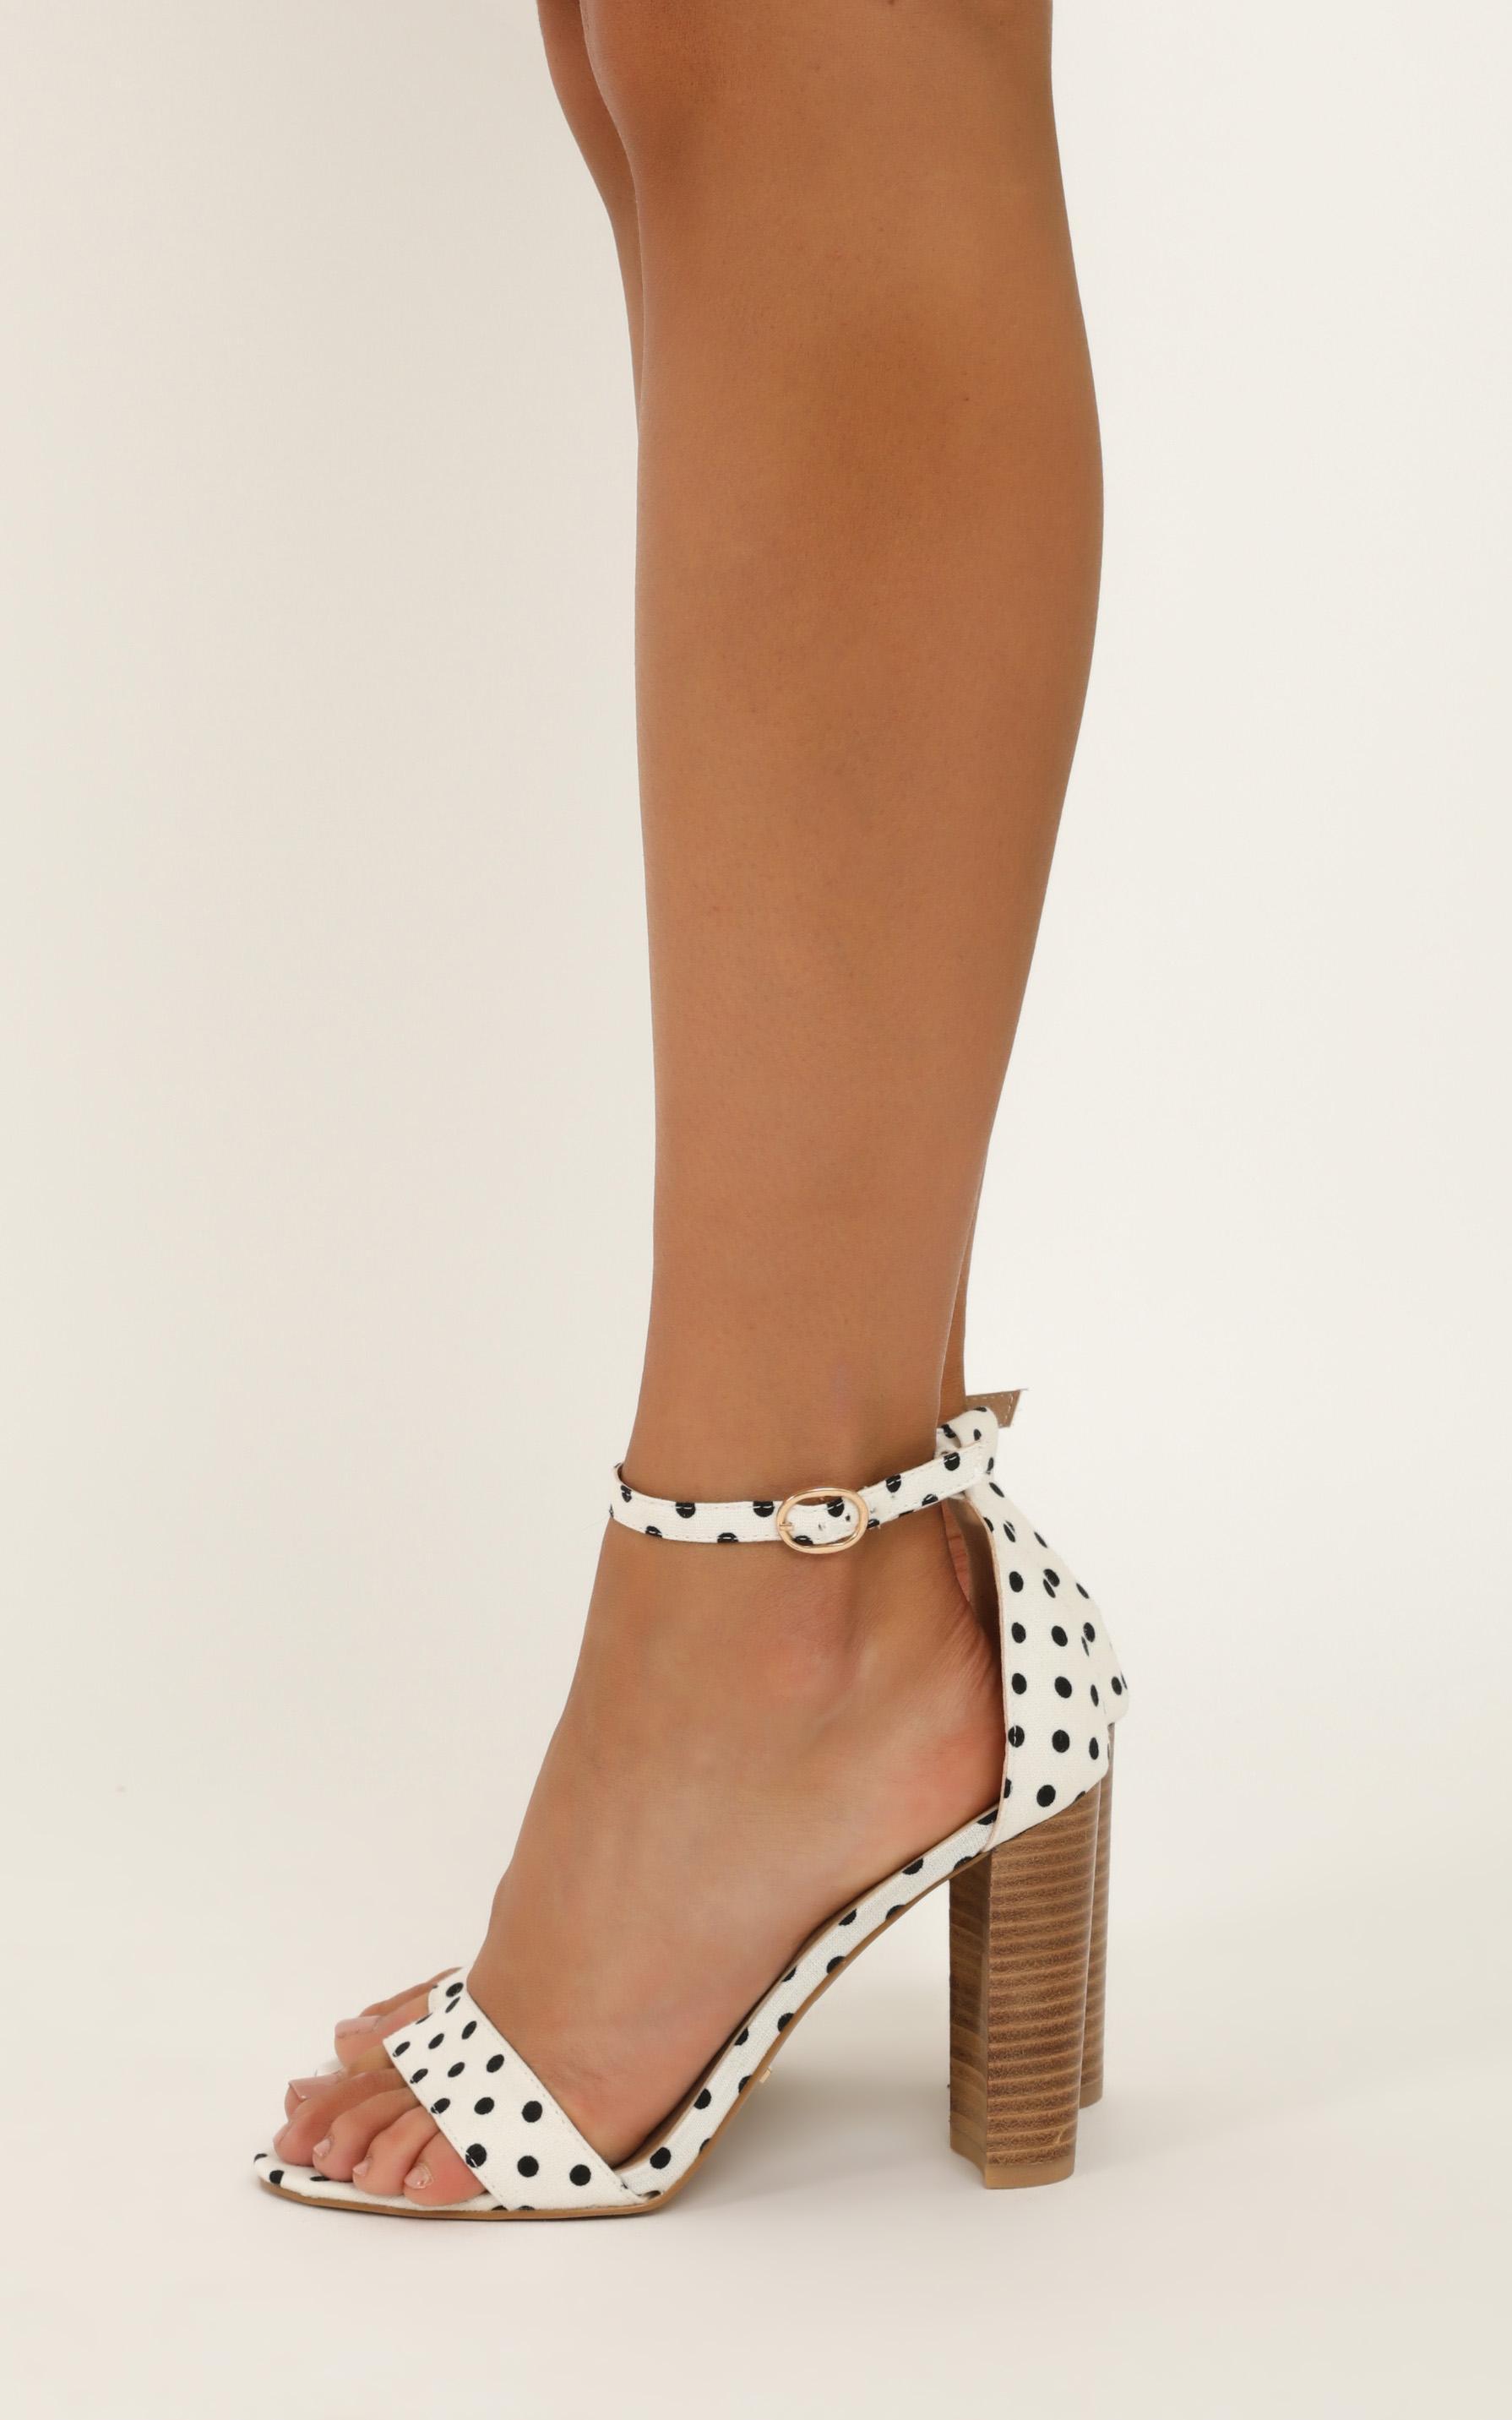 Billini - Jessa heels in white spot - 5, White, hi-res image number null